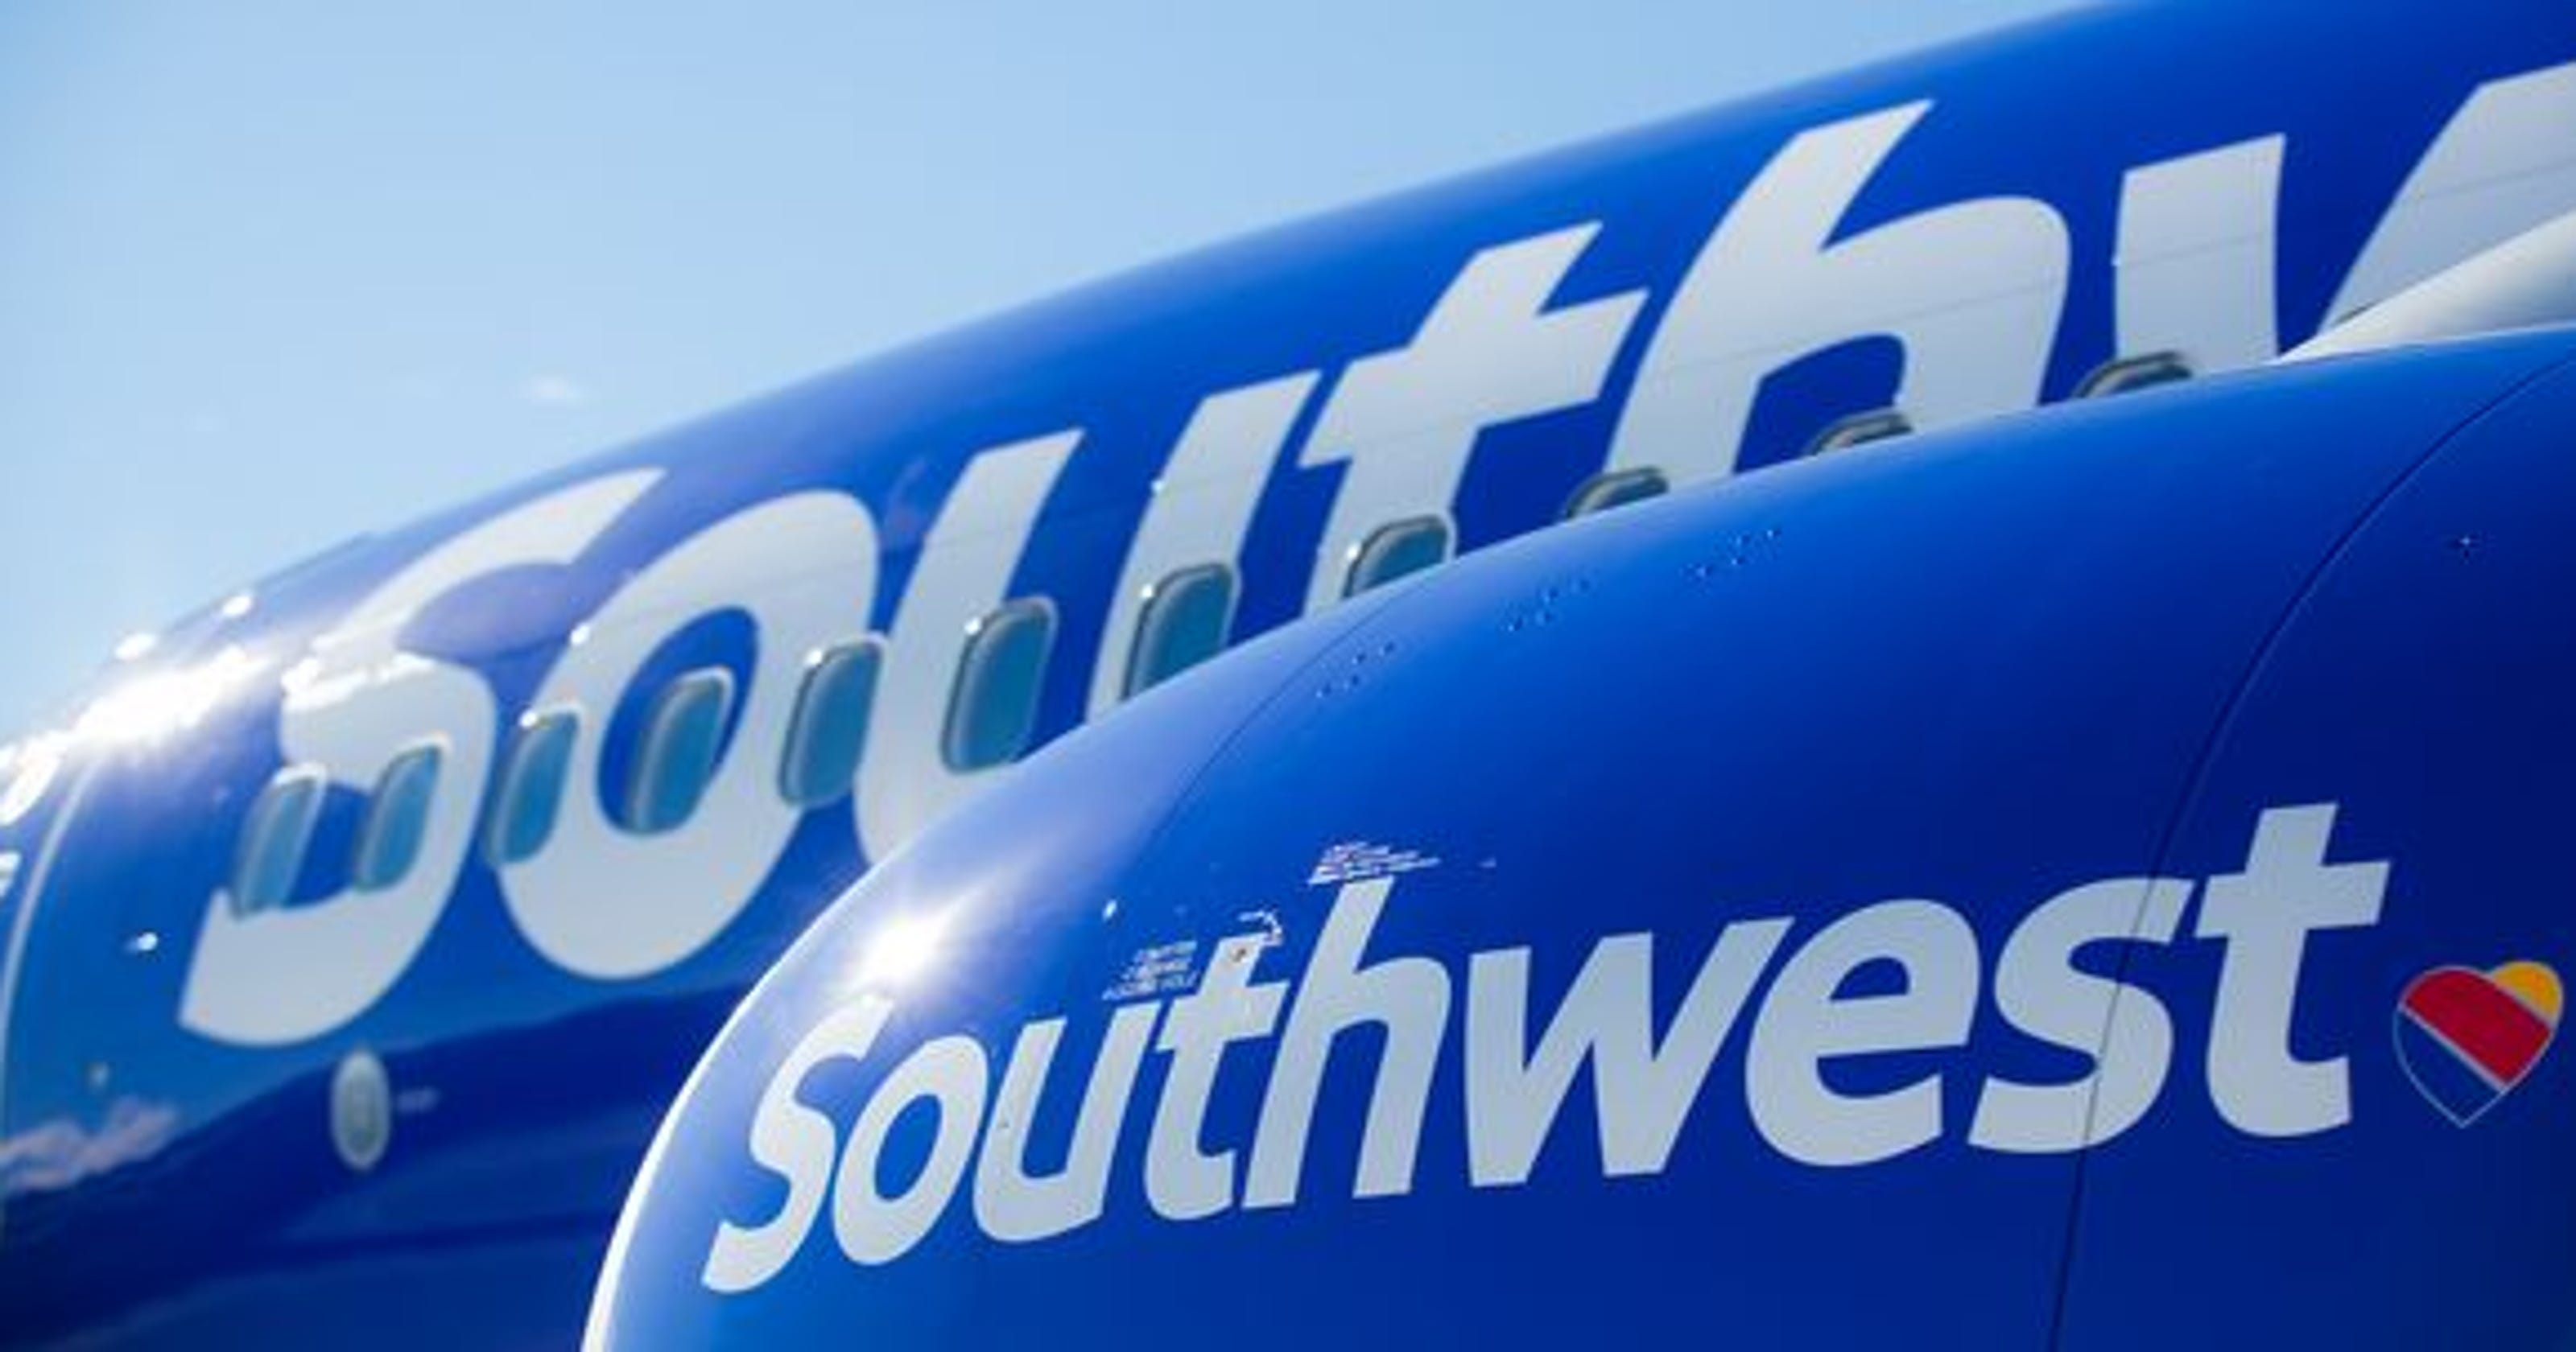 From to jose nashville california san flights